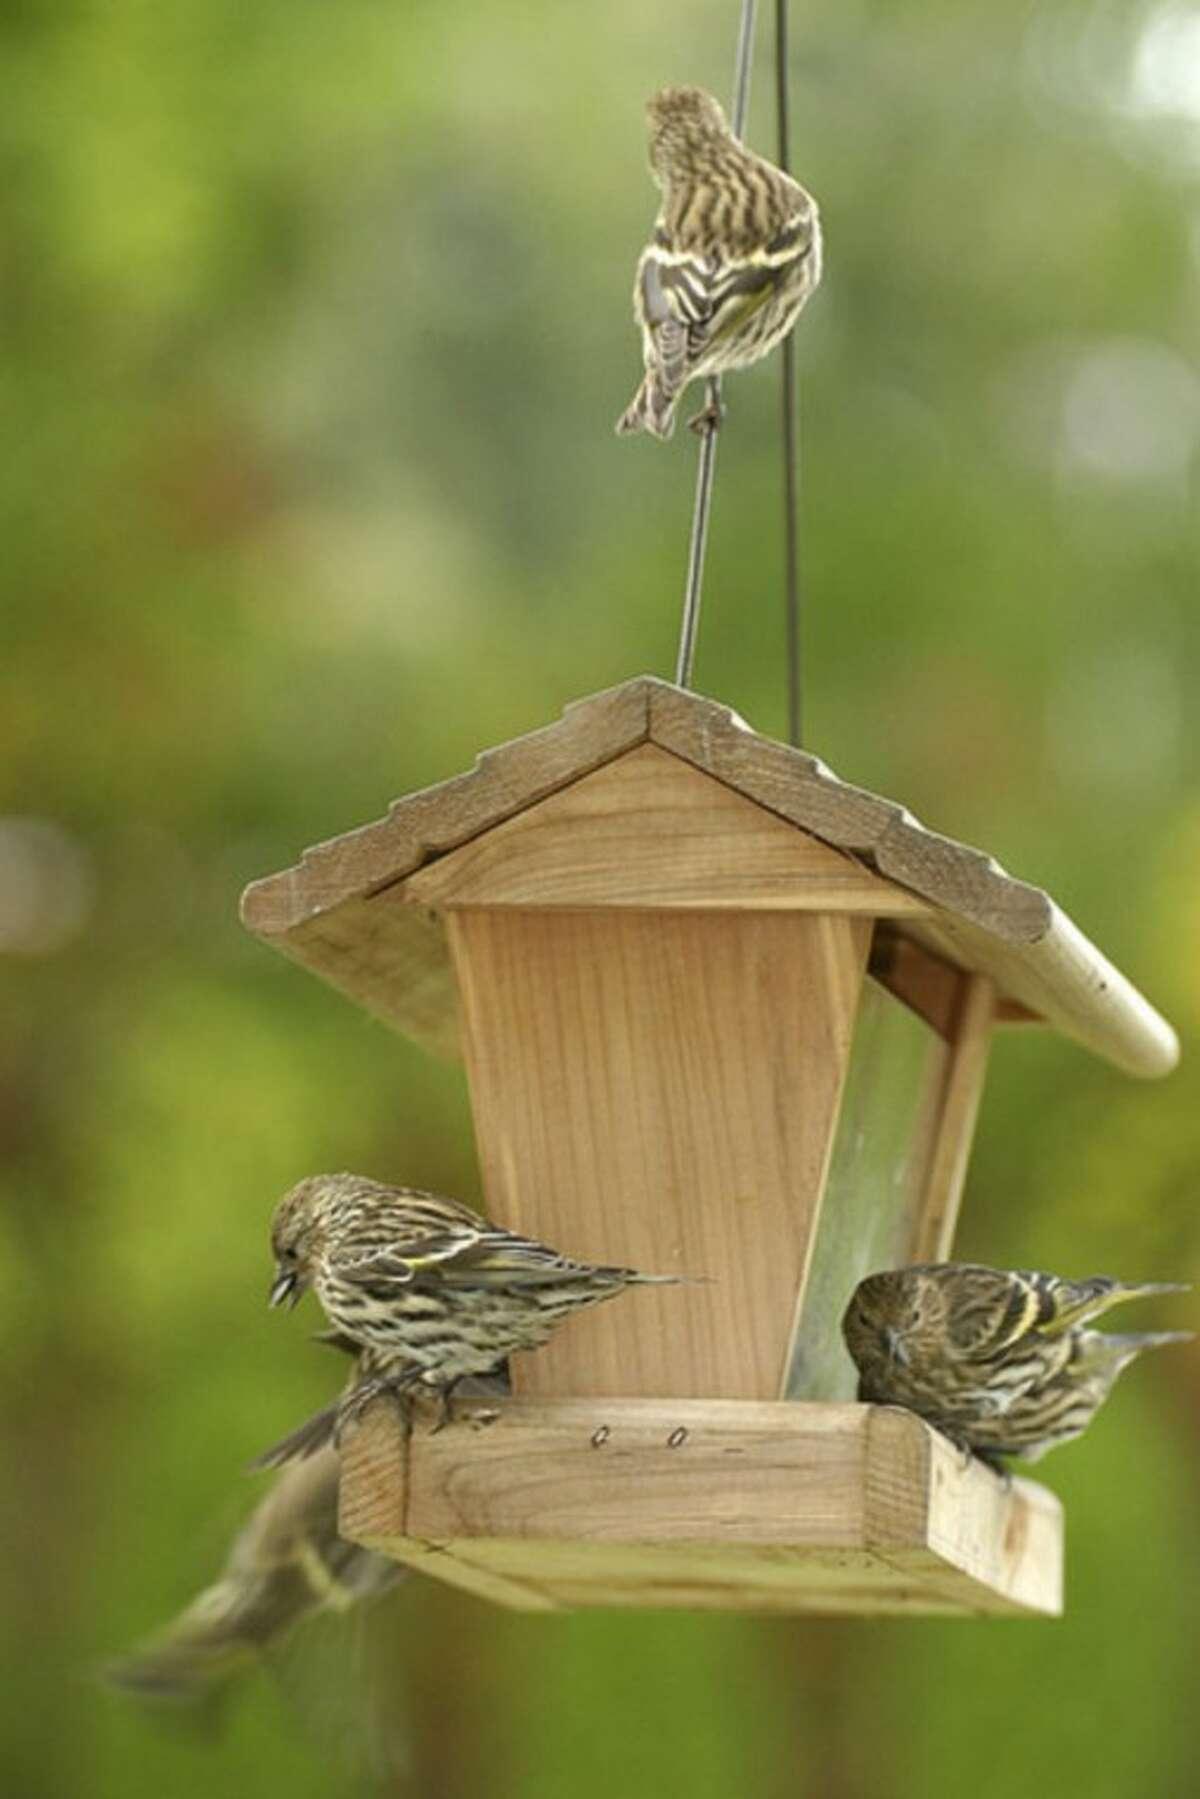 Photo by Chris Bosak Pine Siskins invade a birdfeeding station last week.